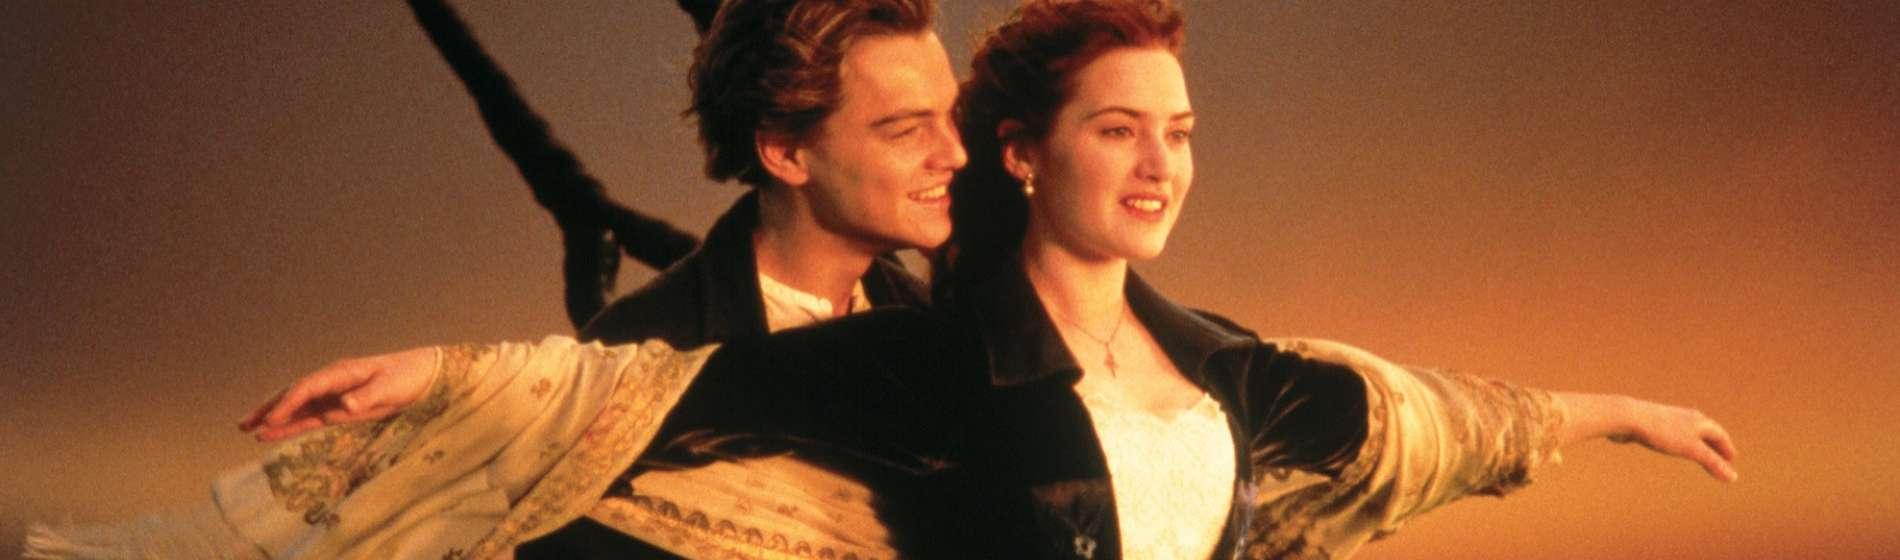 Titanic I'm Flying Scene Kate Winslet Leonardo DiCaprio